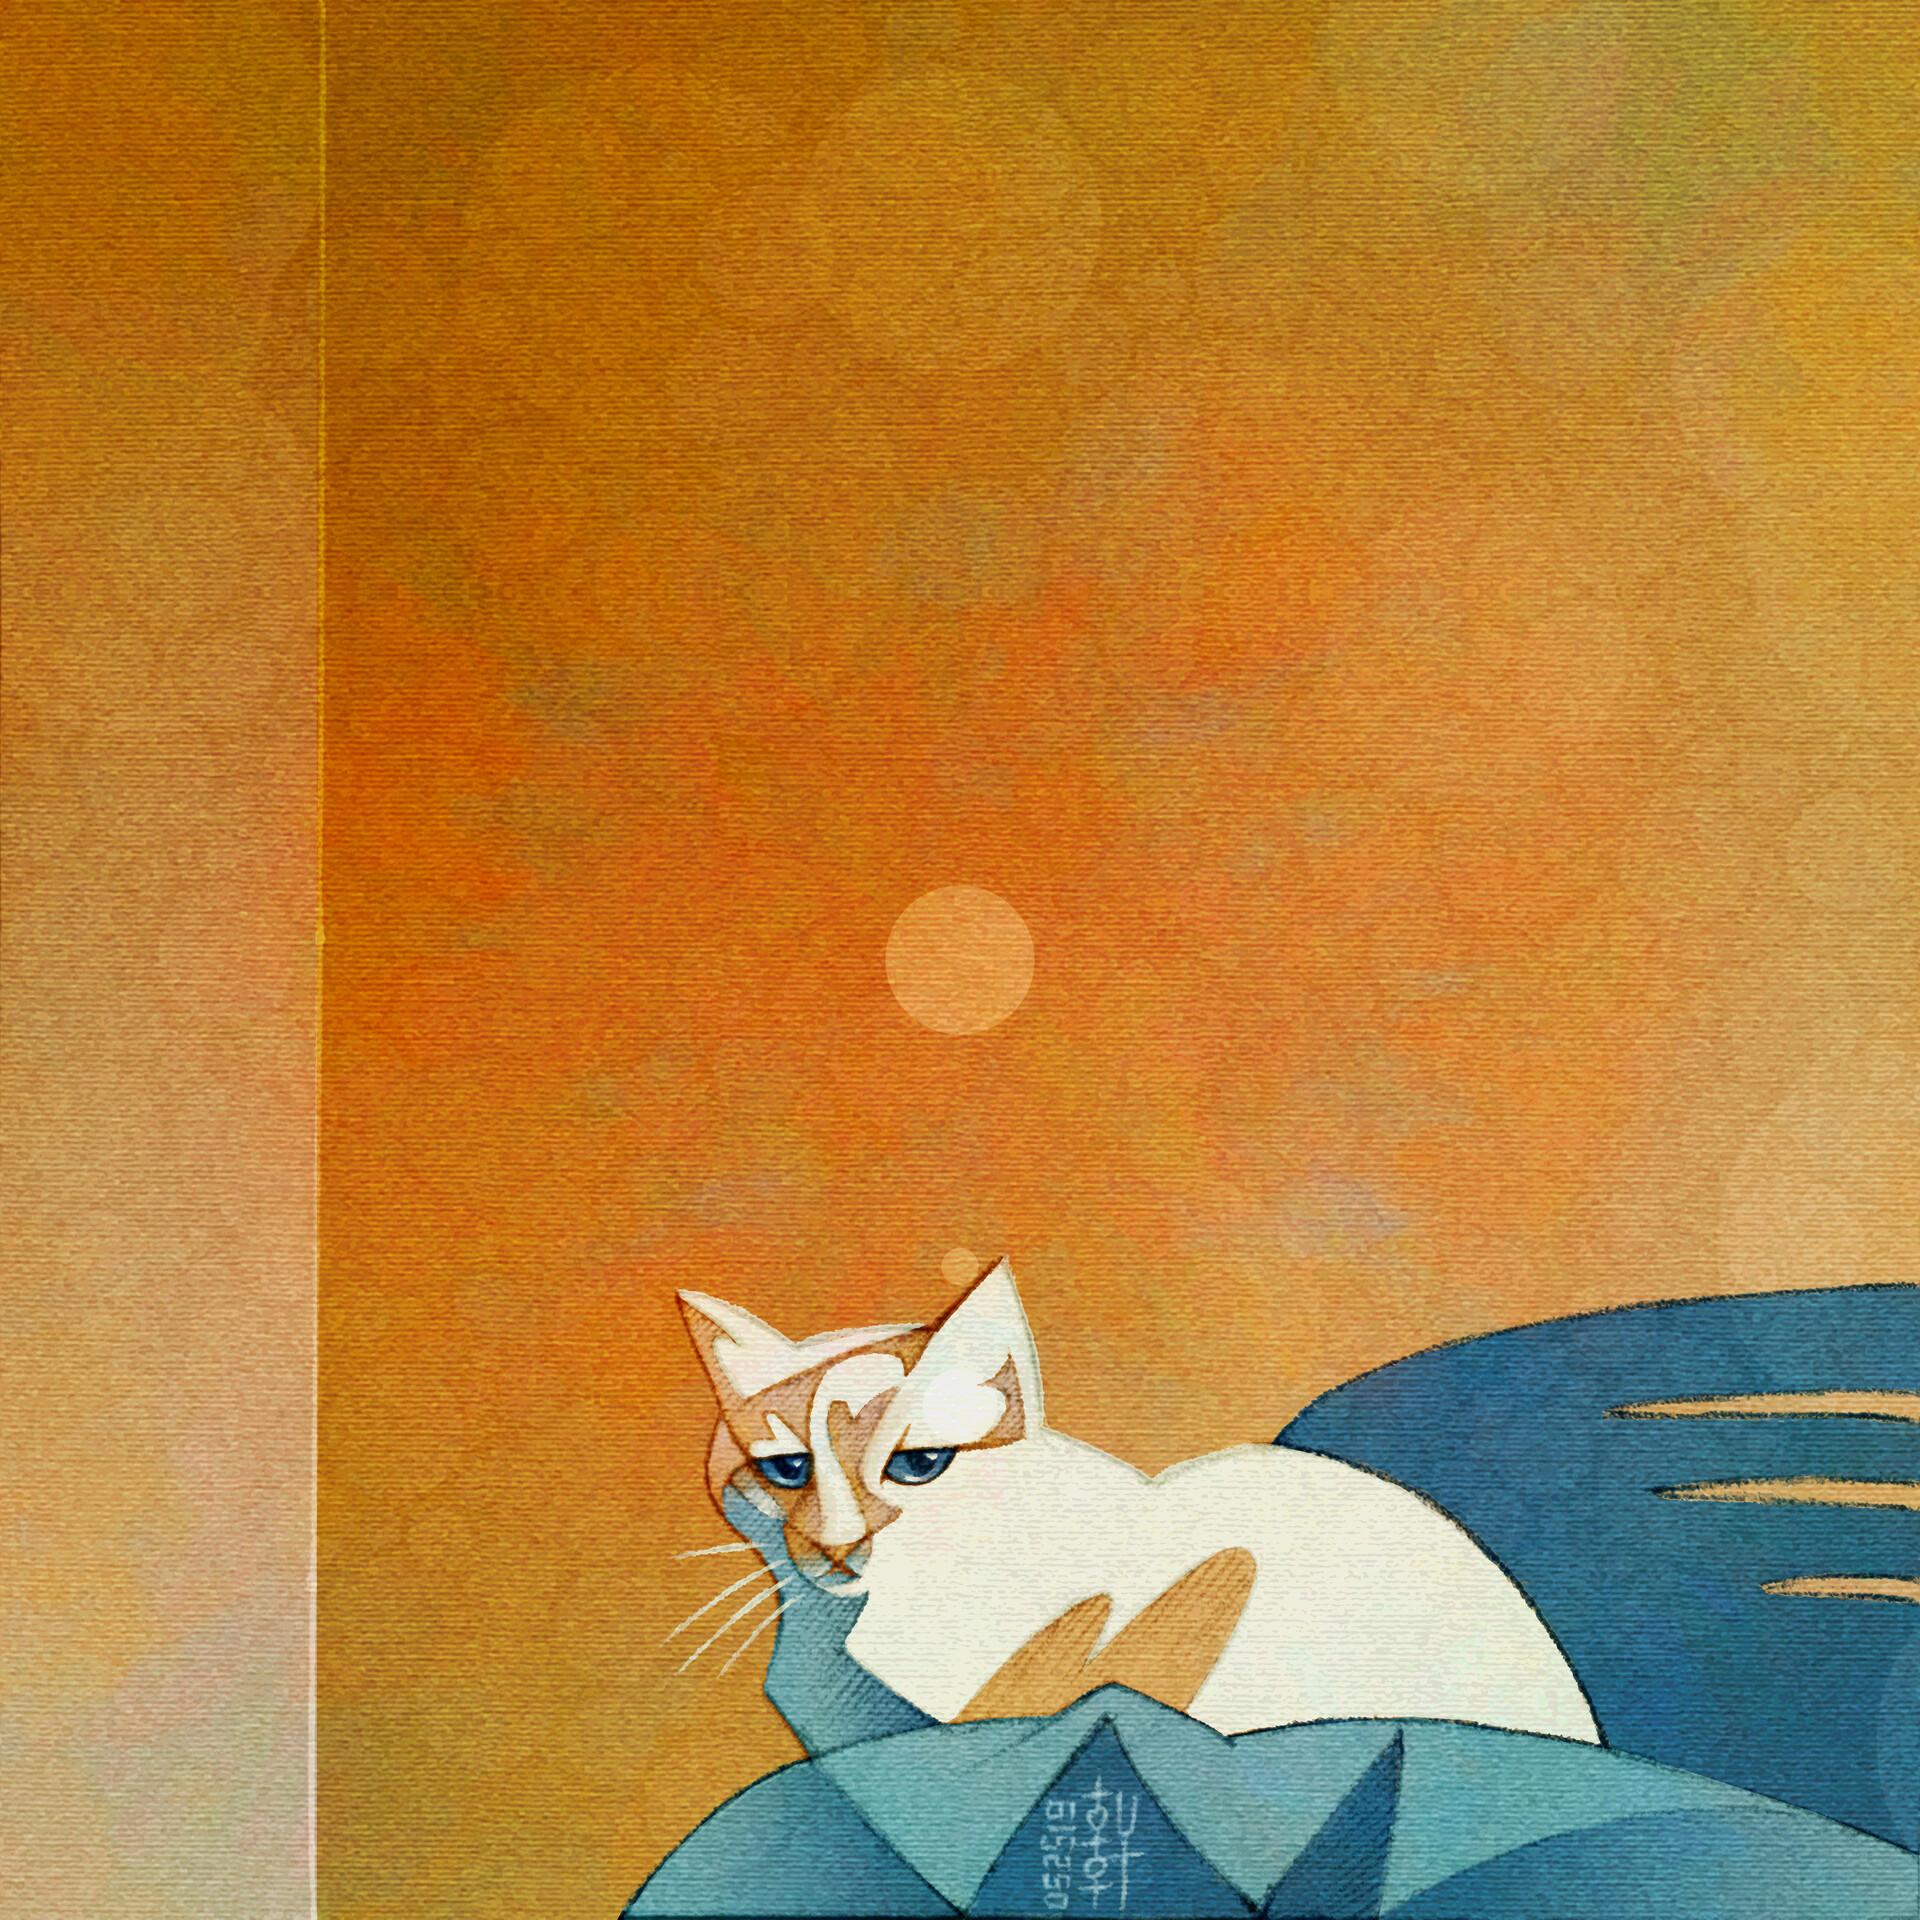 Eric lynx lin catvi orangeroom01